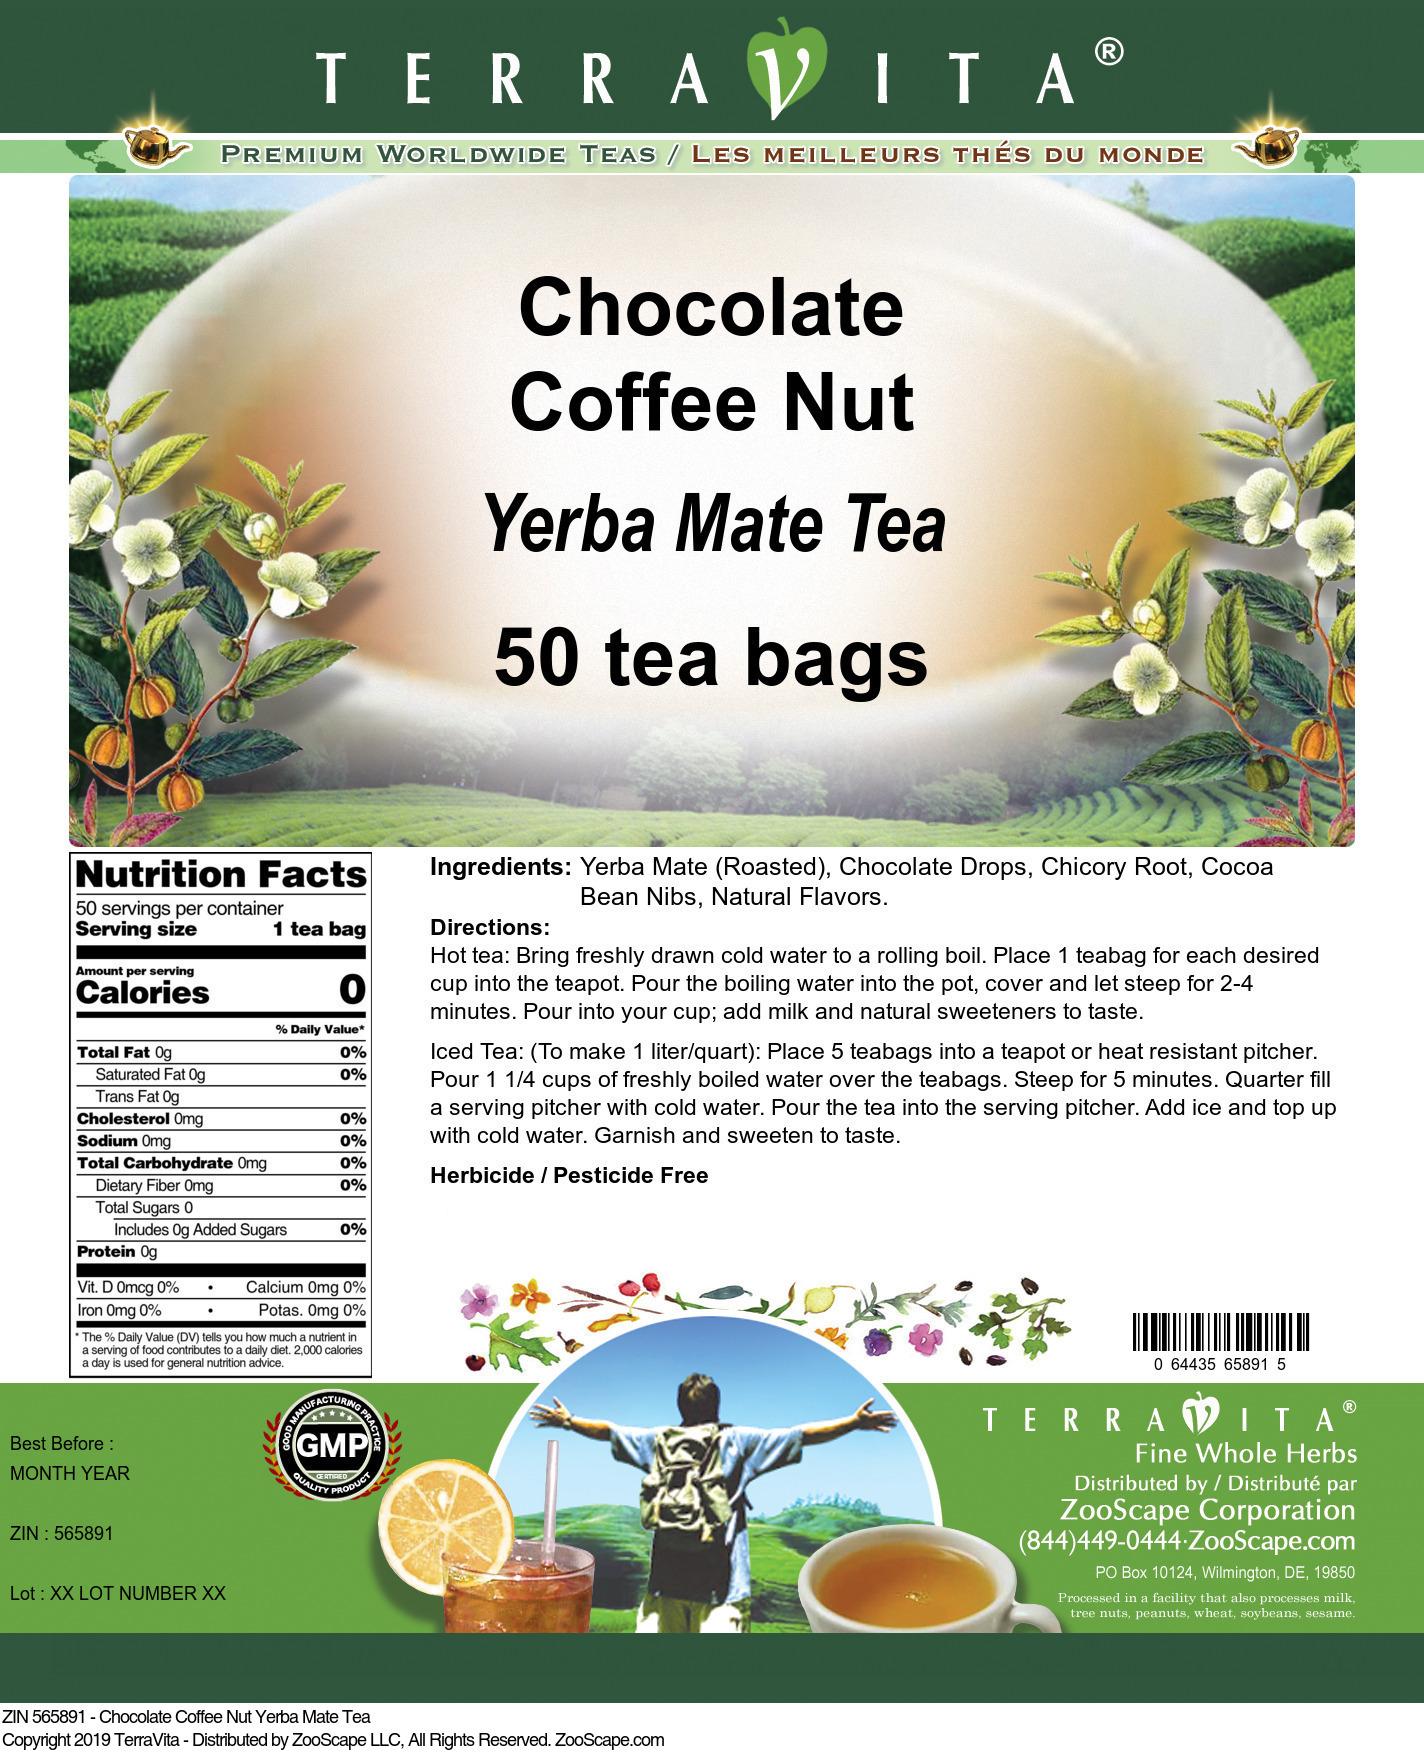 Chocolate Coffee Nut Yerba Mate Tea